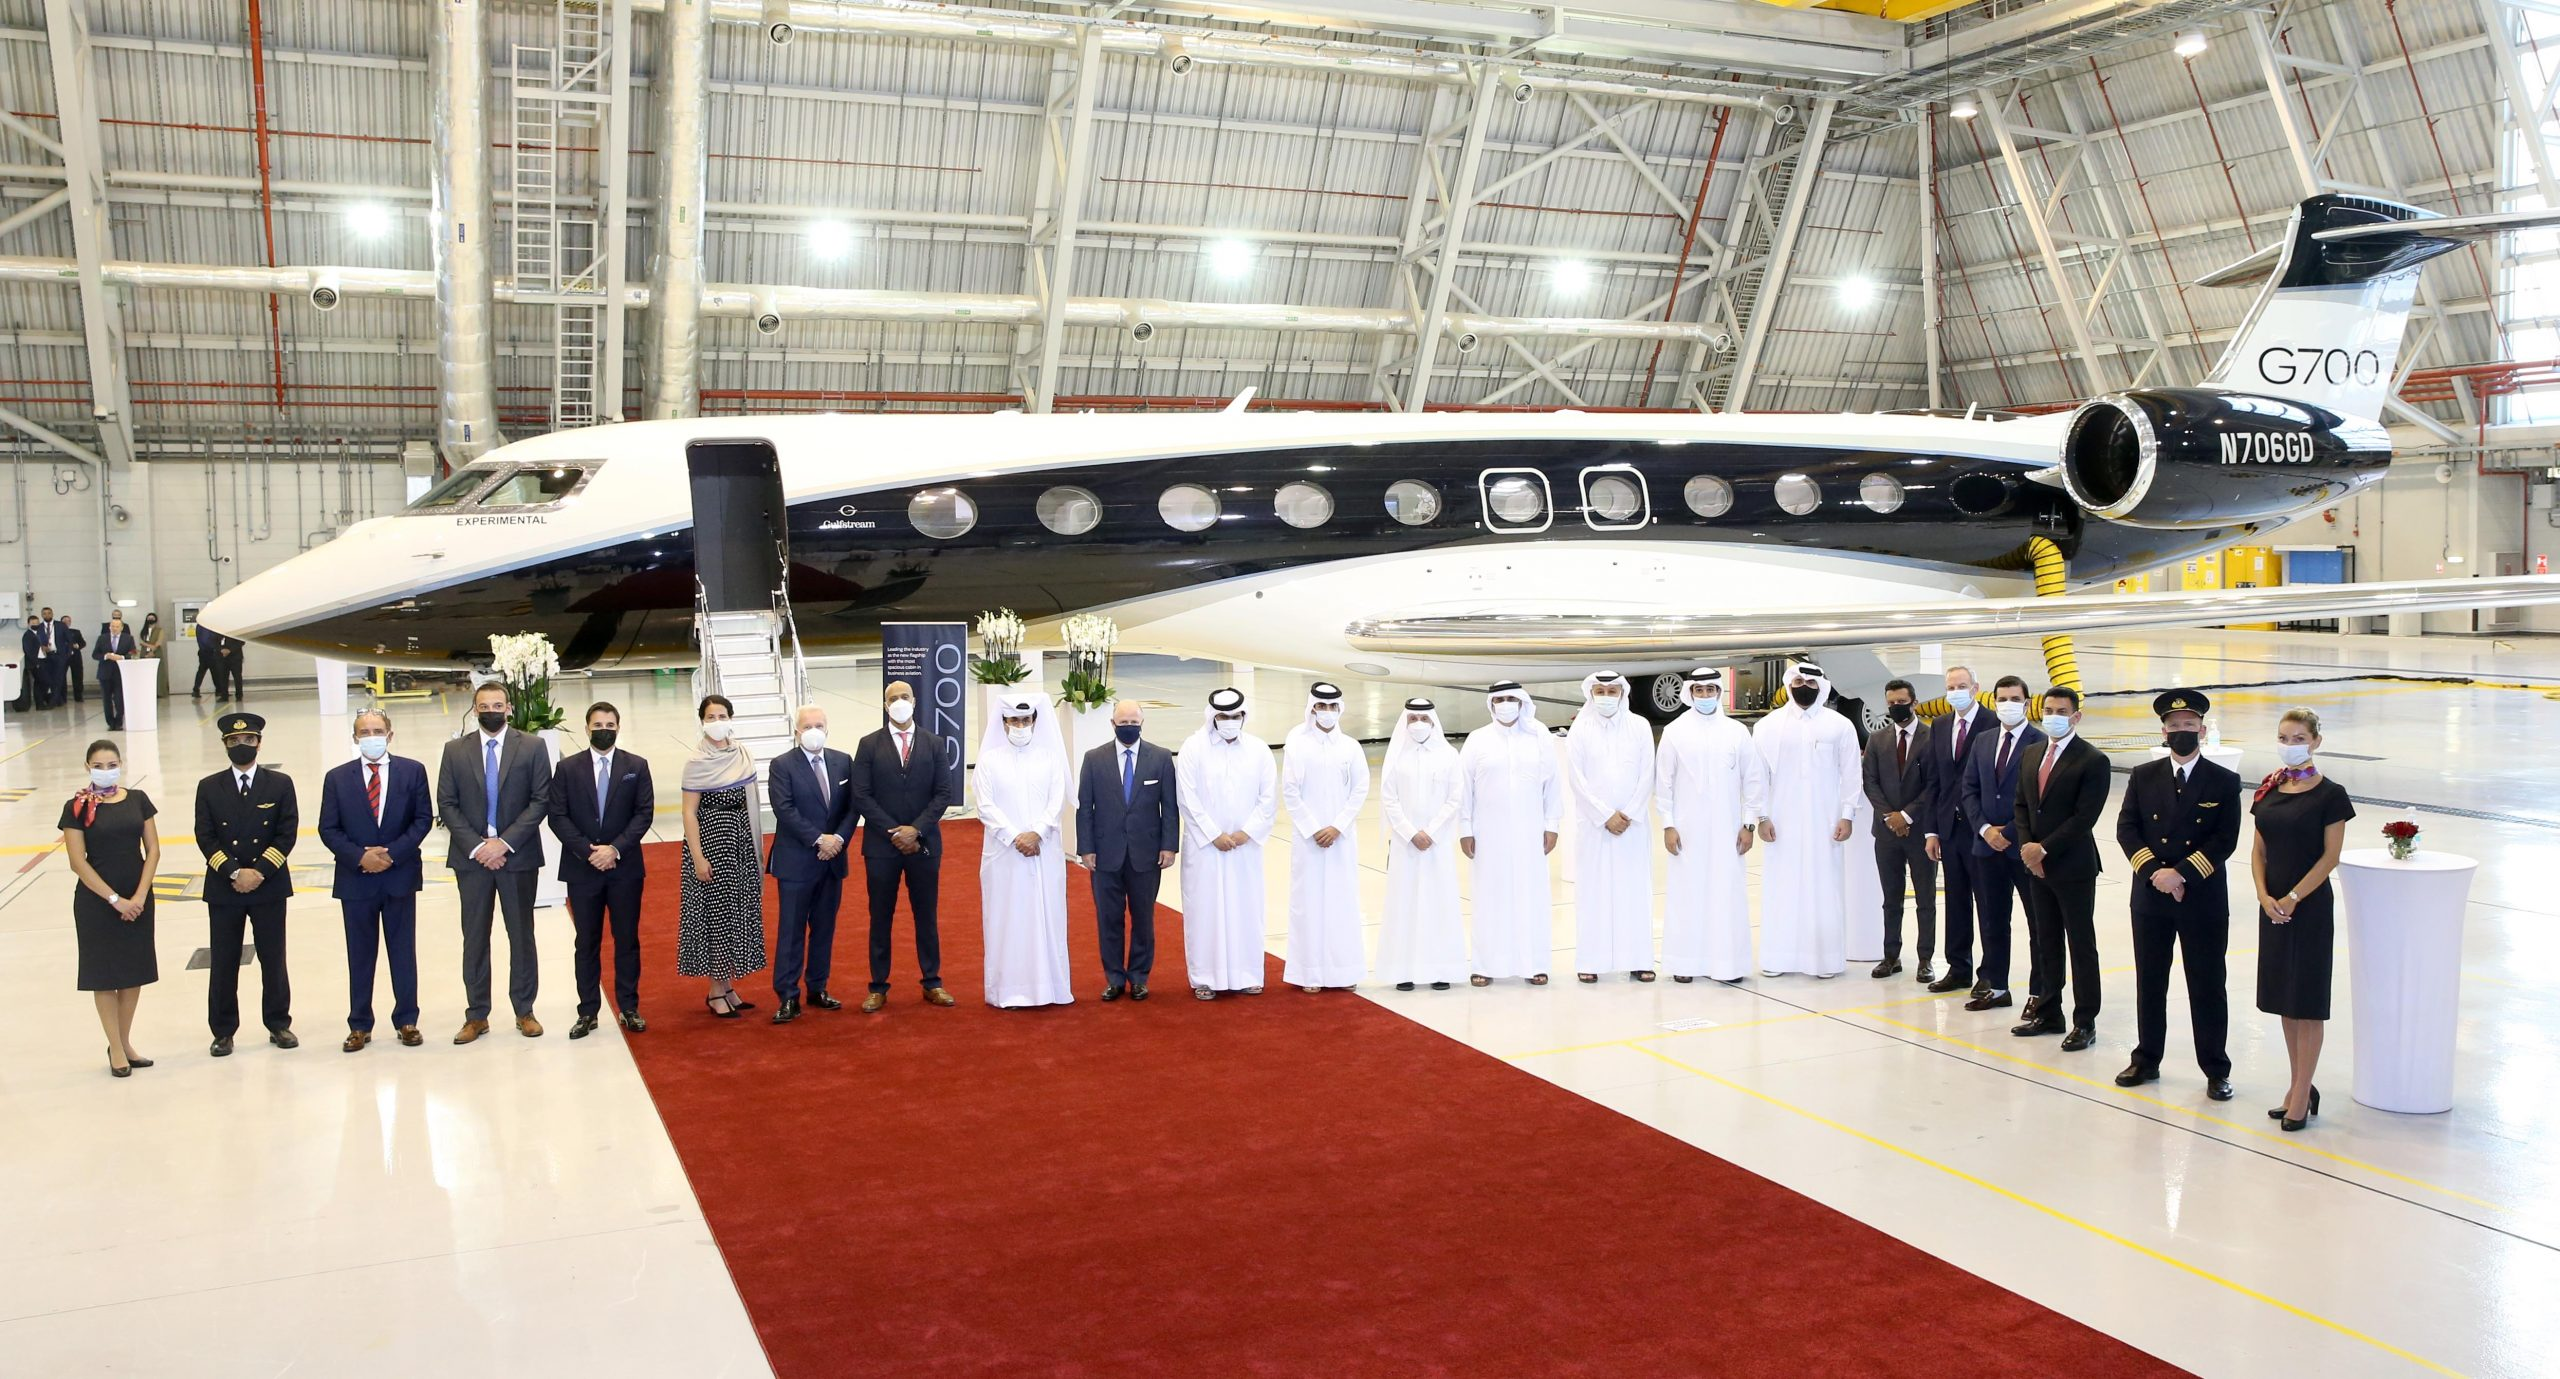 Qatar Executive Showcases Worlds First Gulfstream G700 in Doha